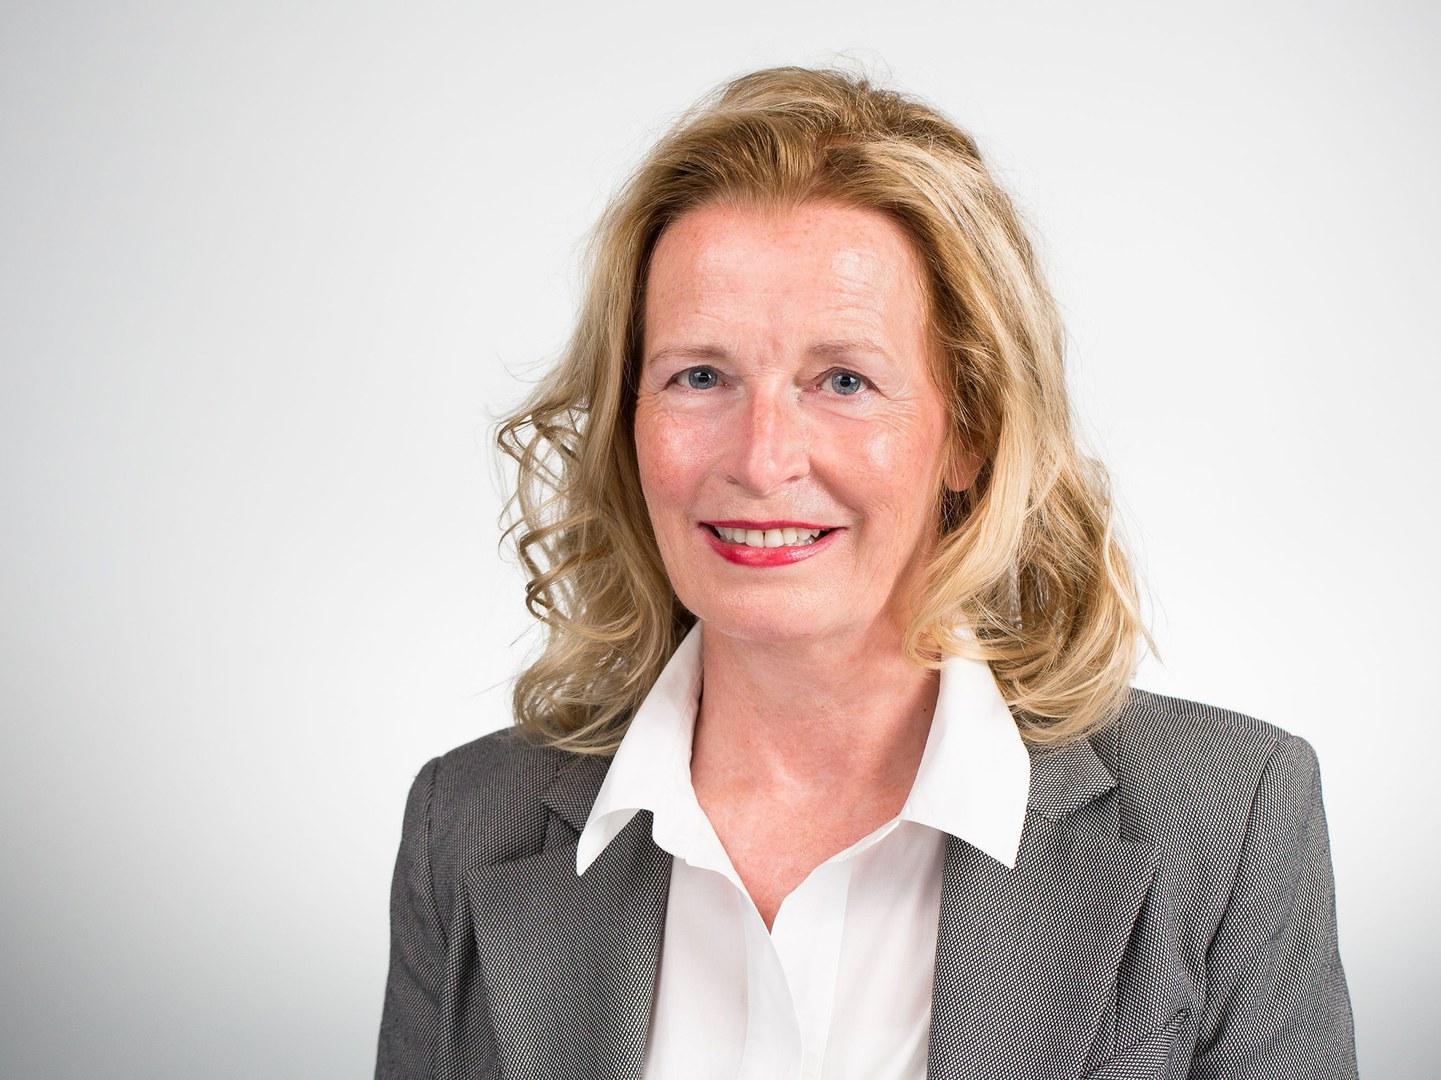 Prof. Dr. Una Röhr-Sendlmeier